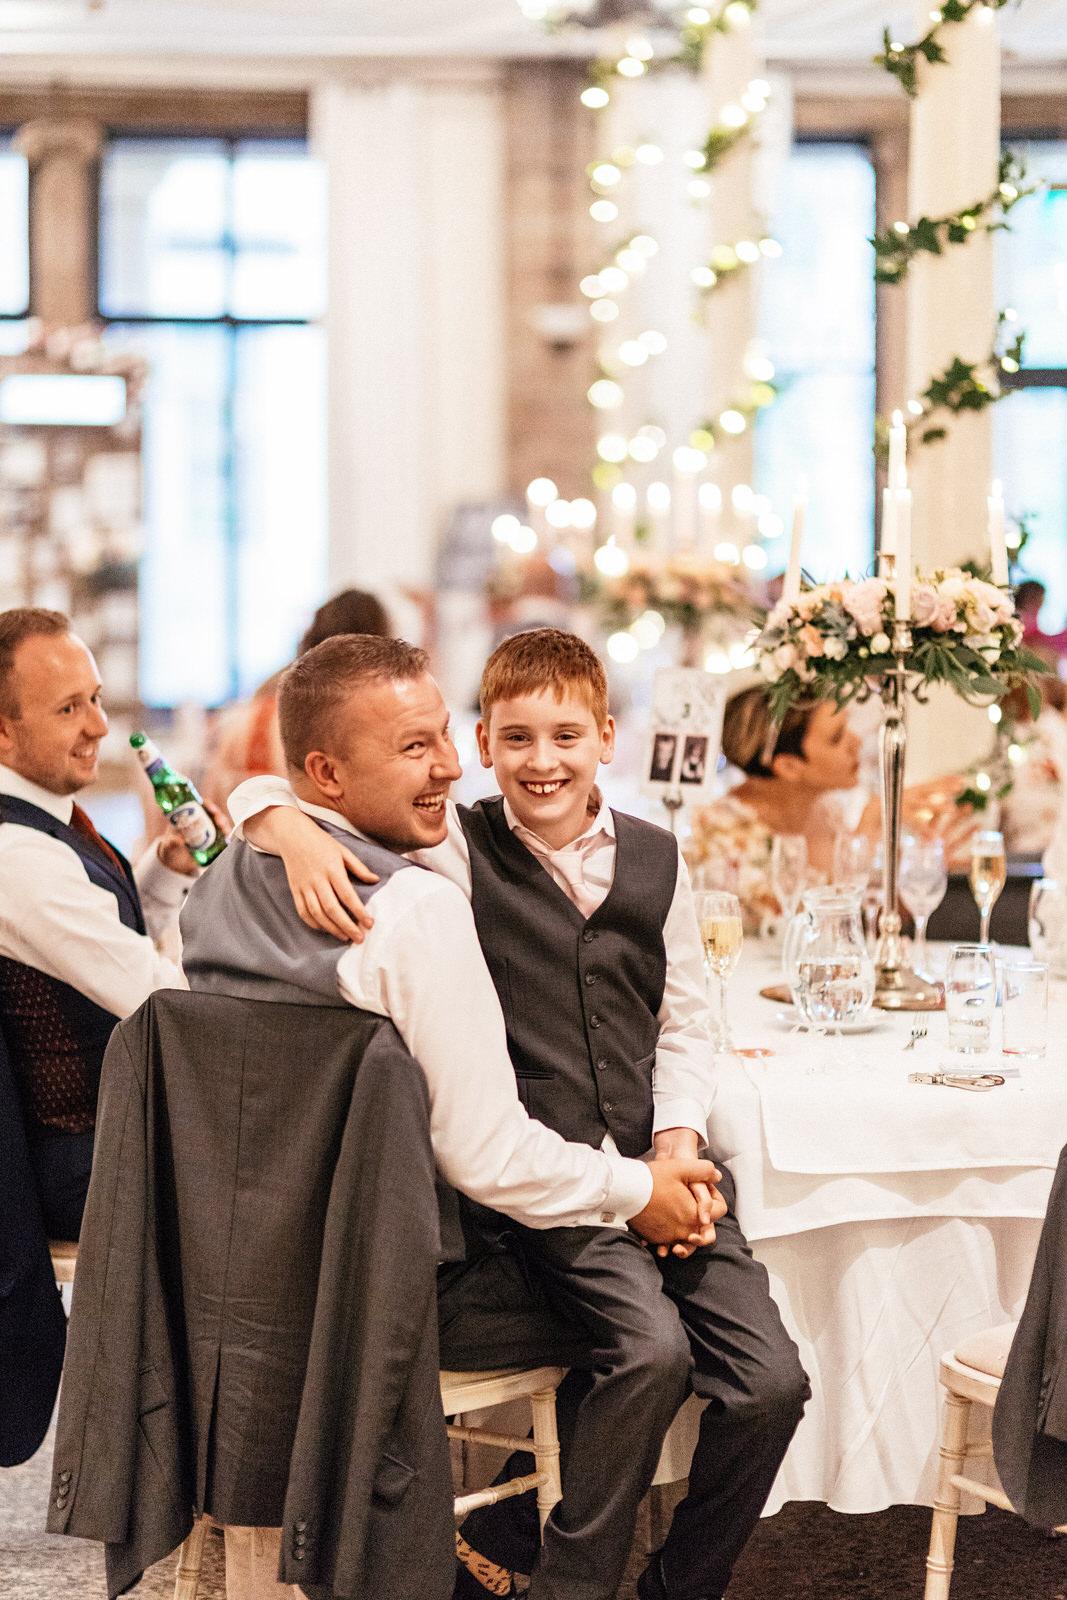 Beamish-Hall-Wedding-Photographer-053.jpg